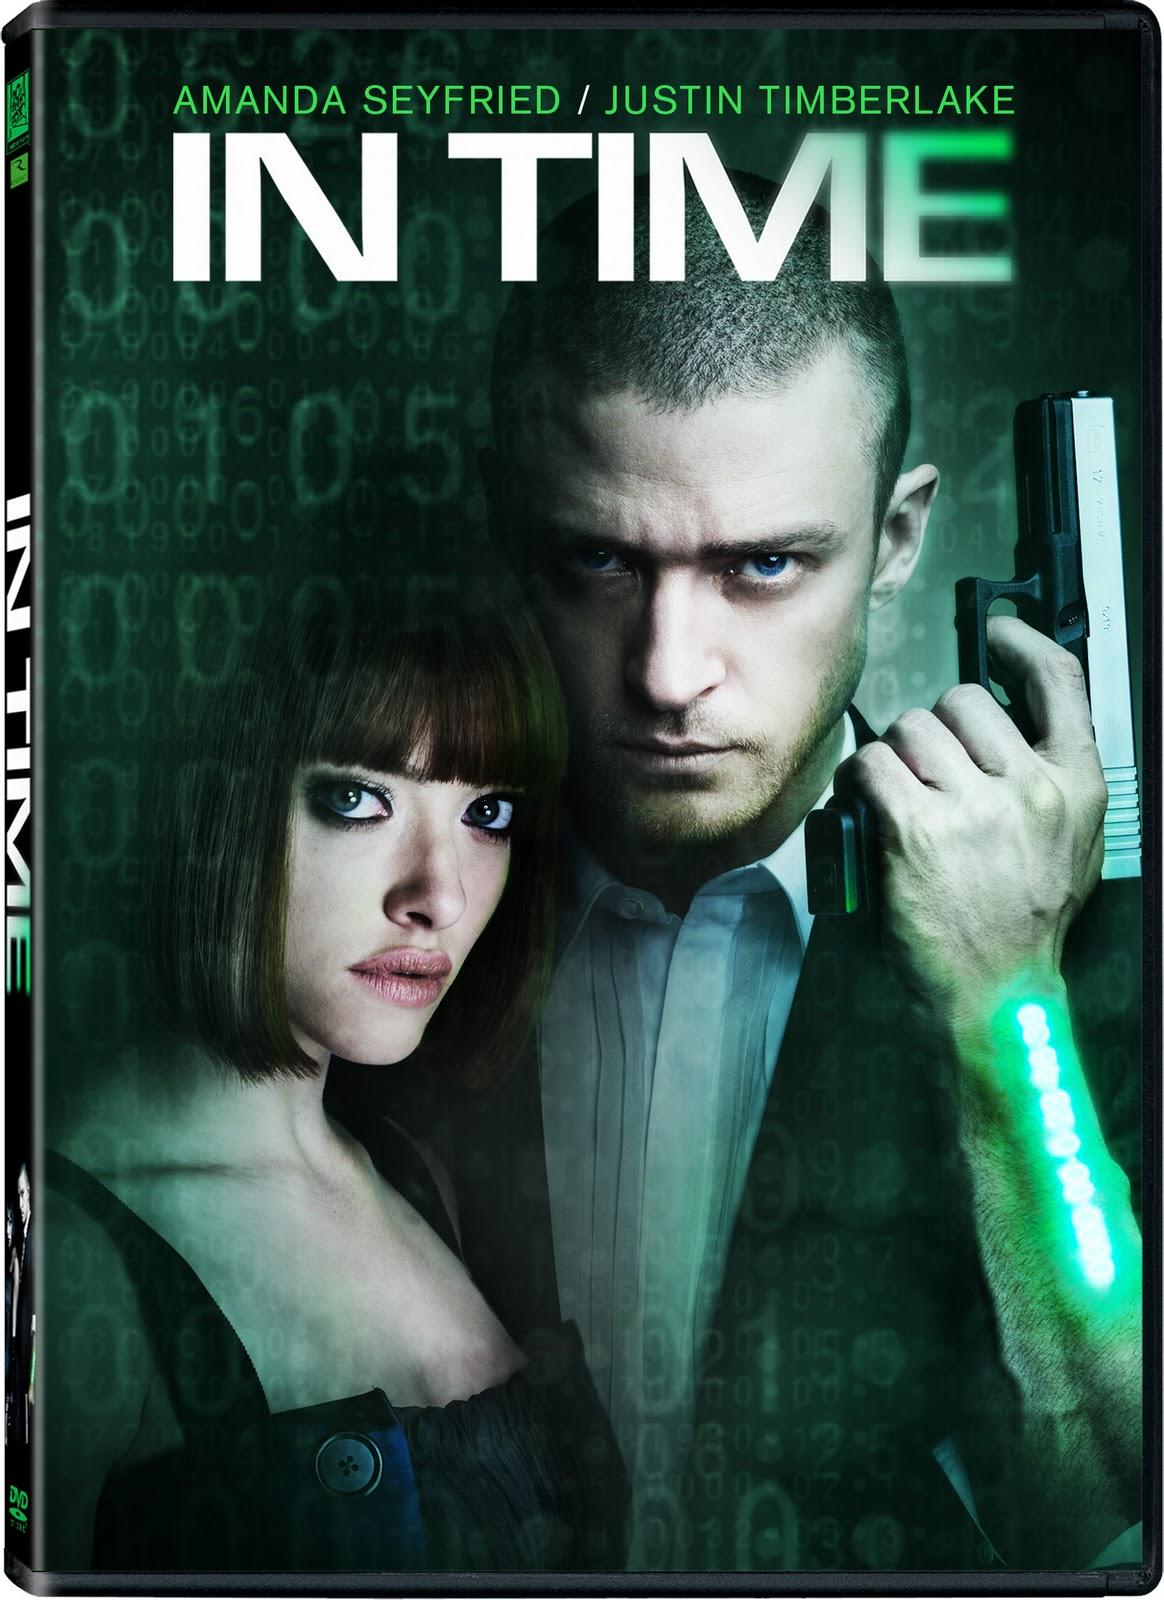 http://4.bp.blogspot.com/-H1XfyyT8PTs/TxSgP3IpsDI/AAAAAAAADkY/rXUCmX_oe4Y/s1600/In_Time_DVD.jpg